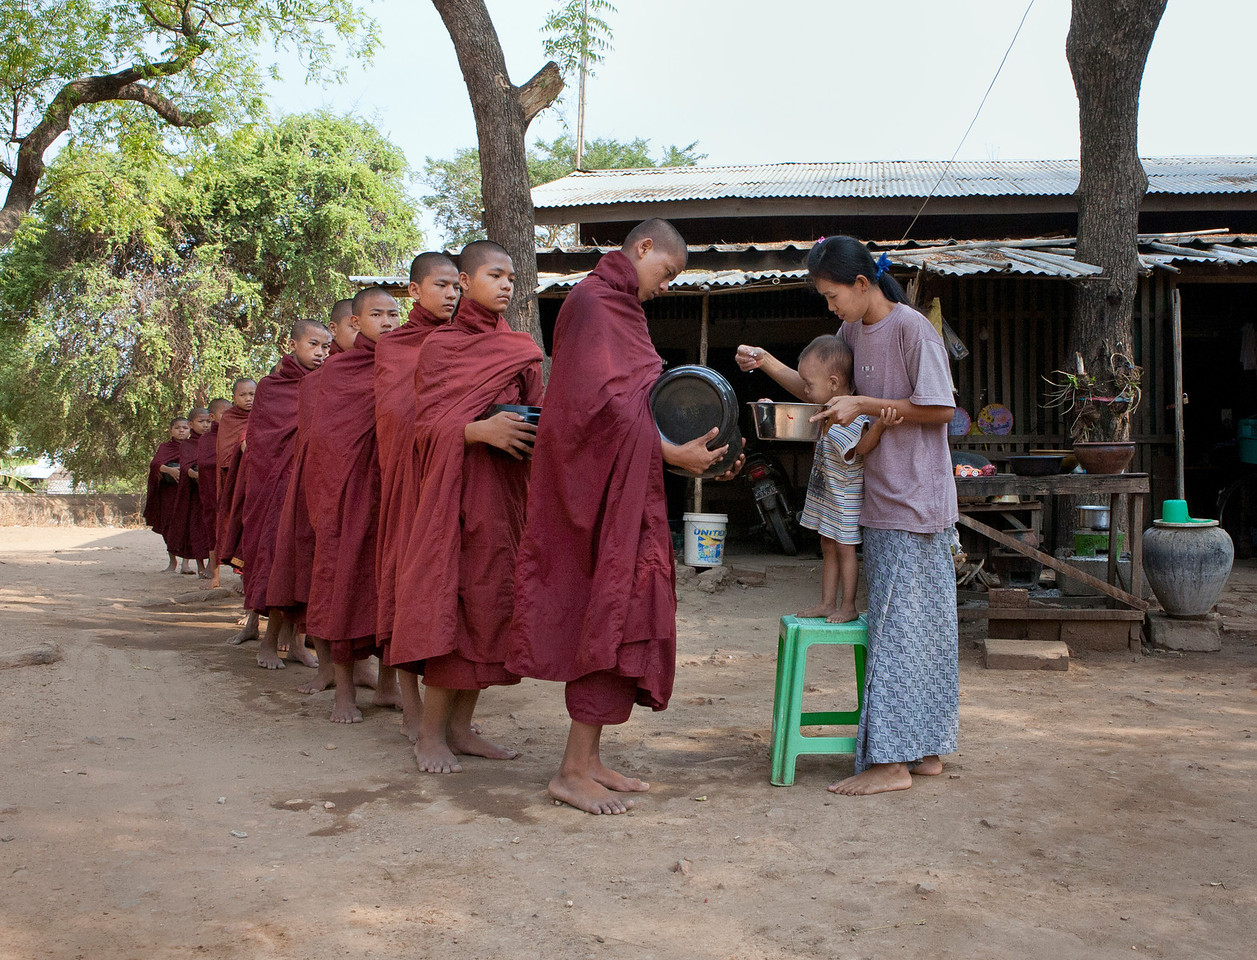 Receiving Alms in Bagan